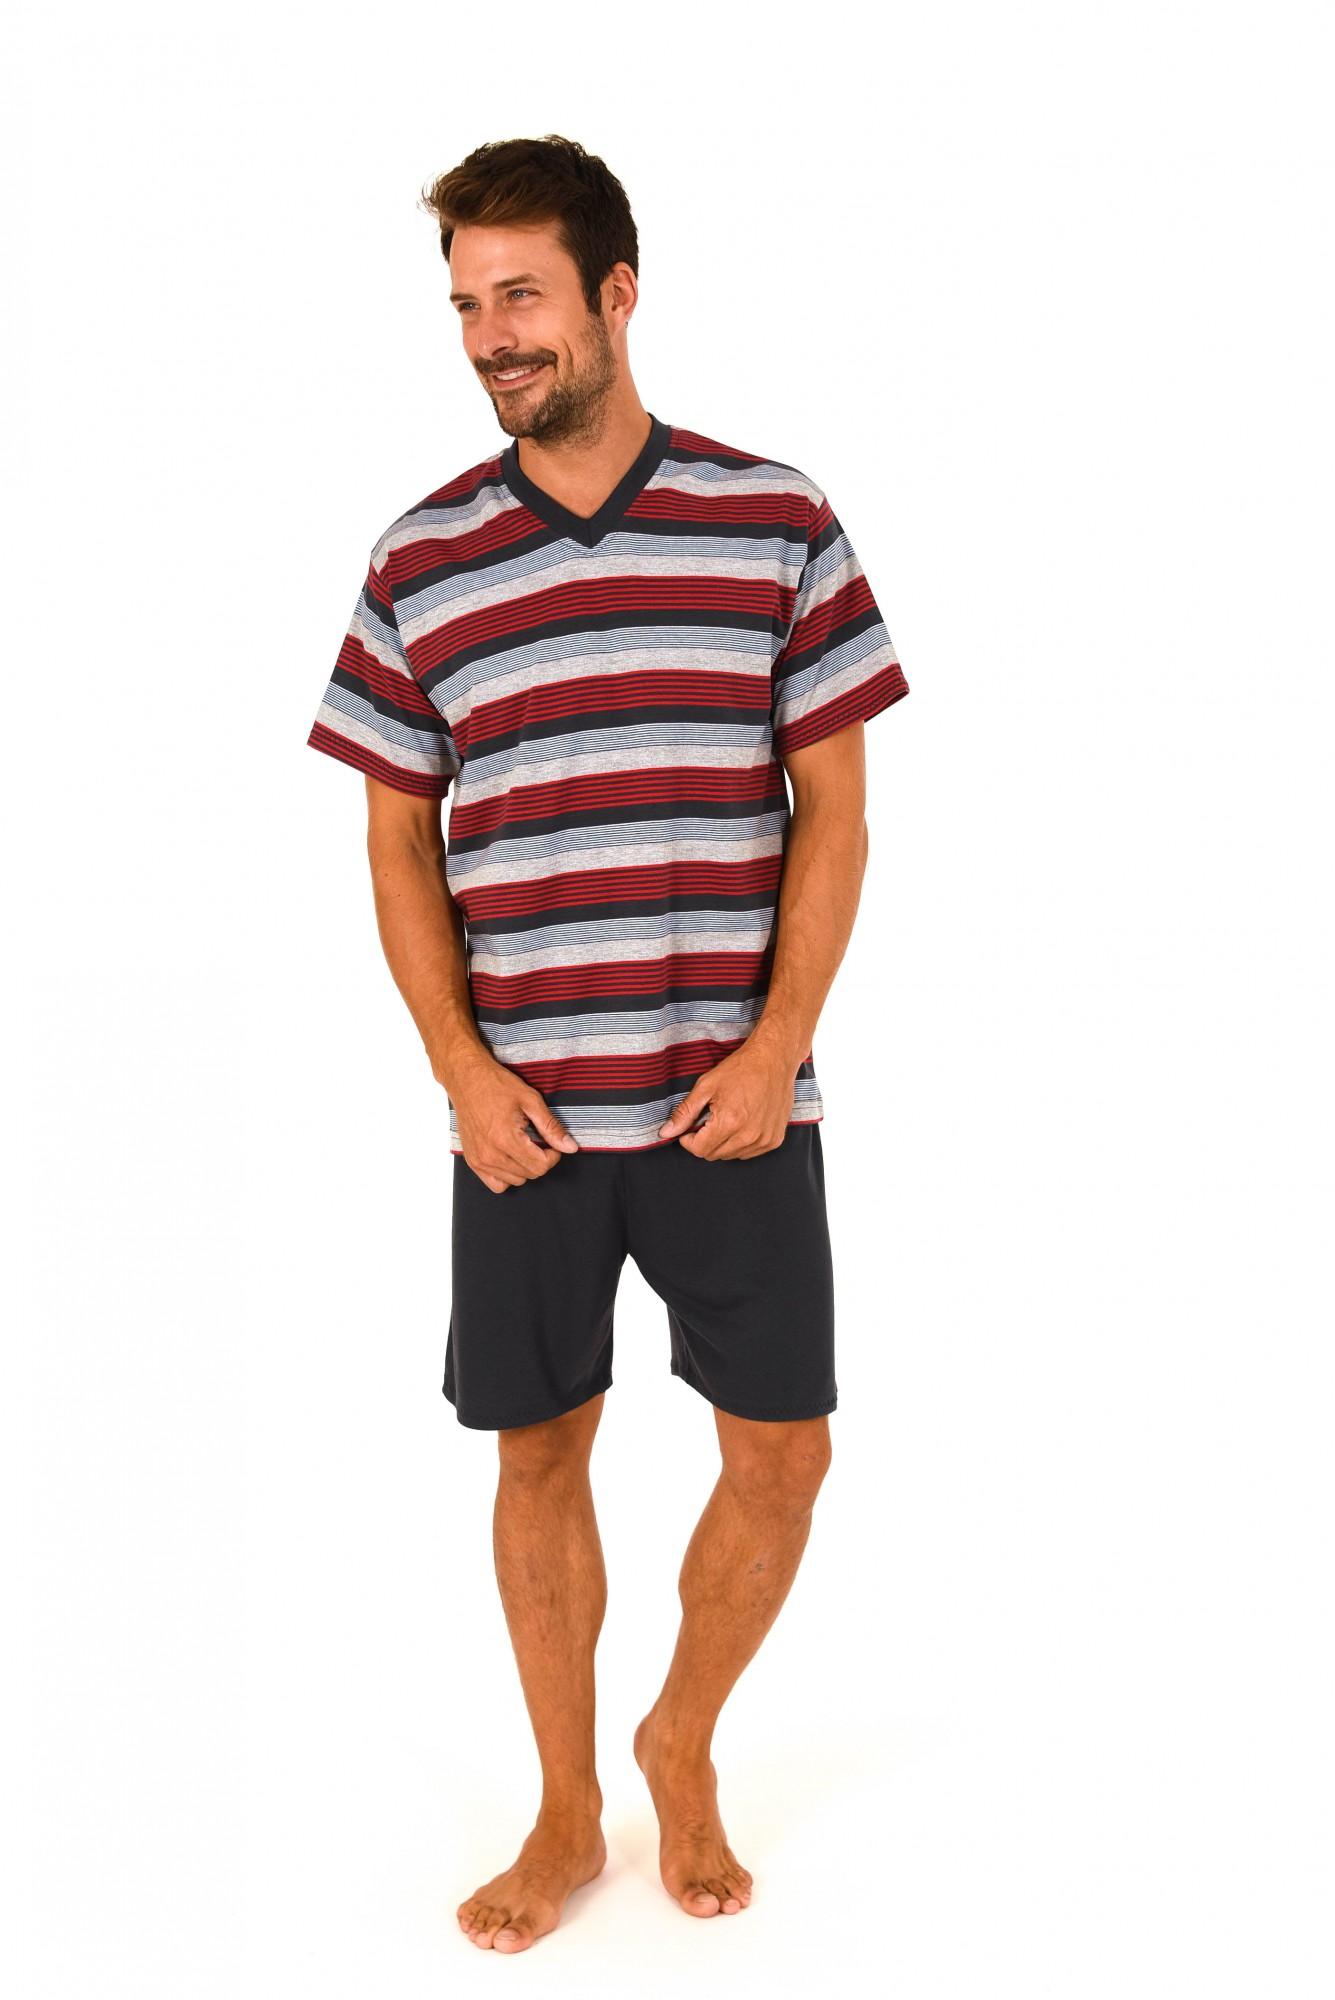 Herren Pyjama Shorty kurzarm gestreift – 171 105 90 724 001